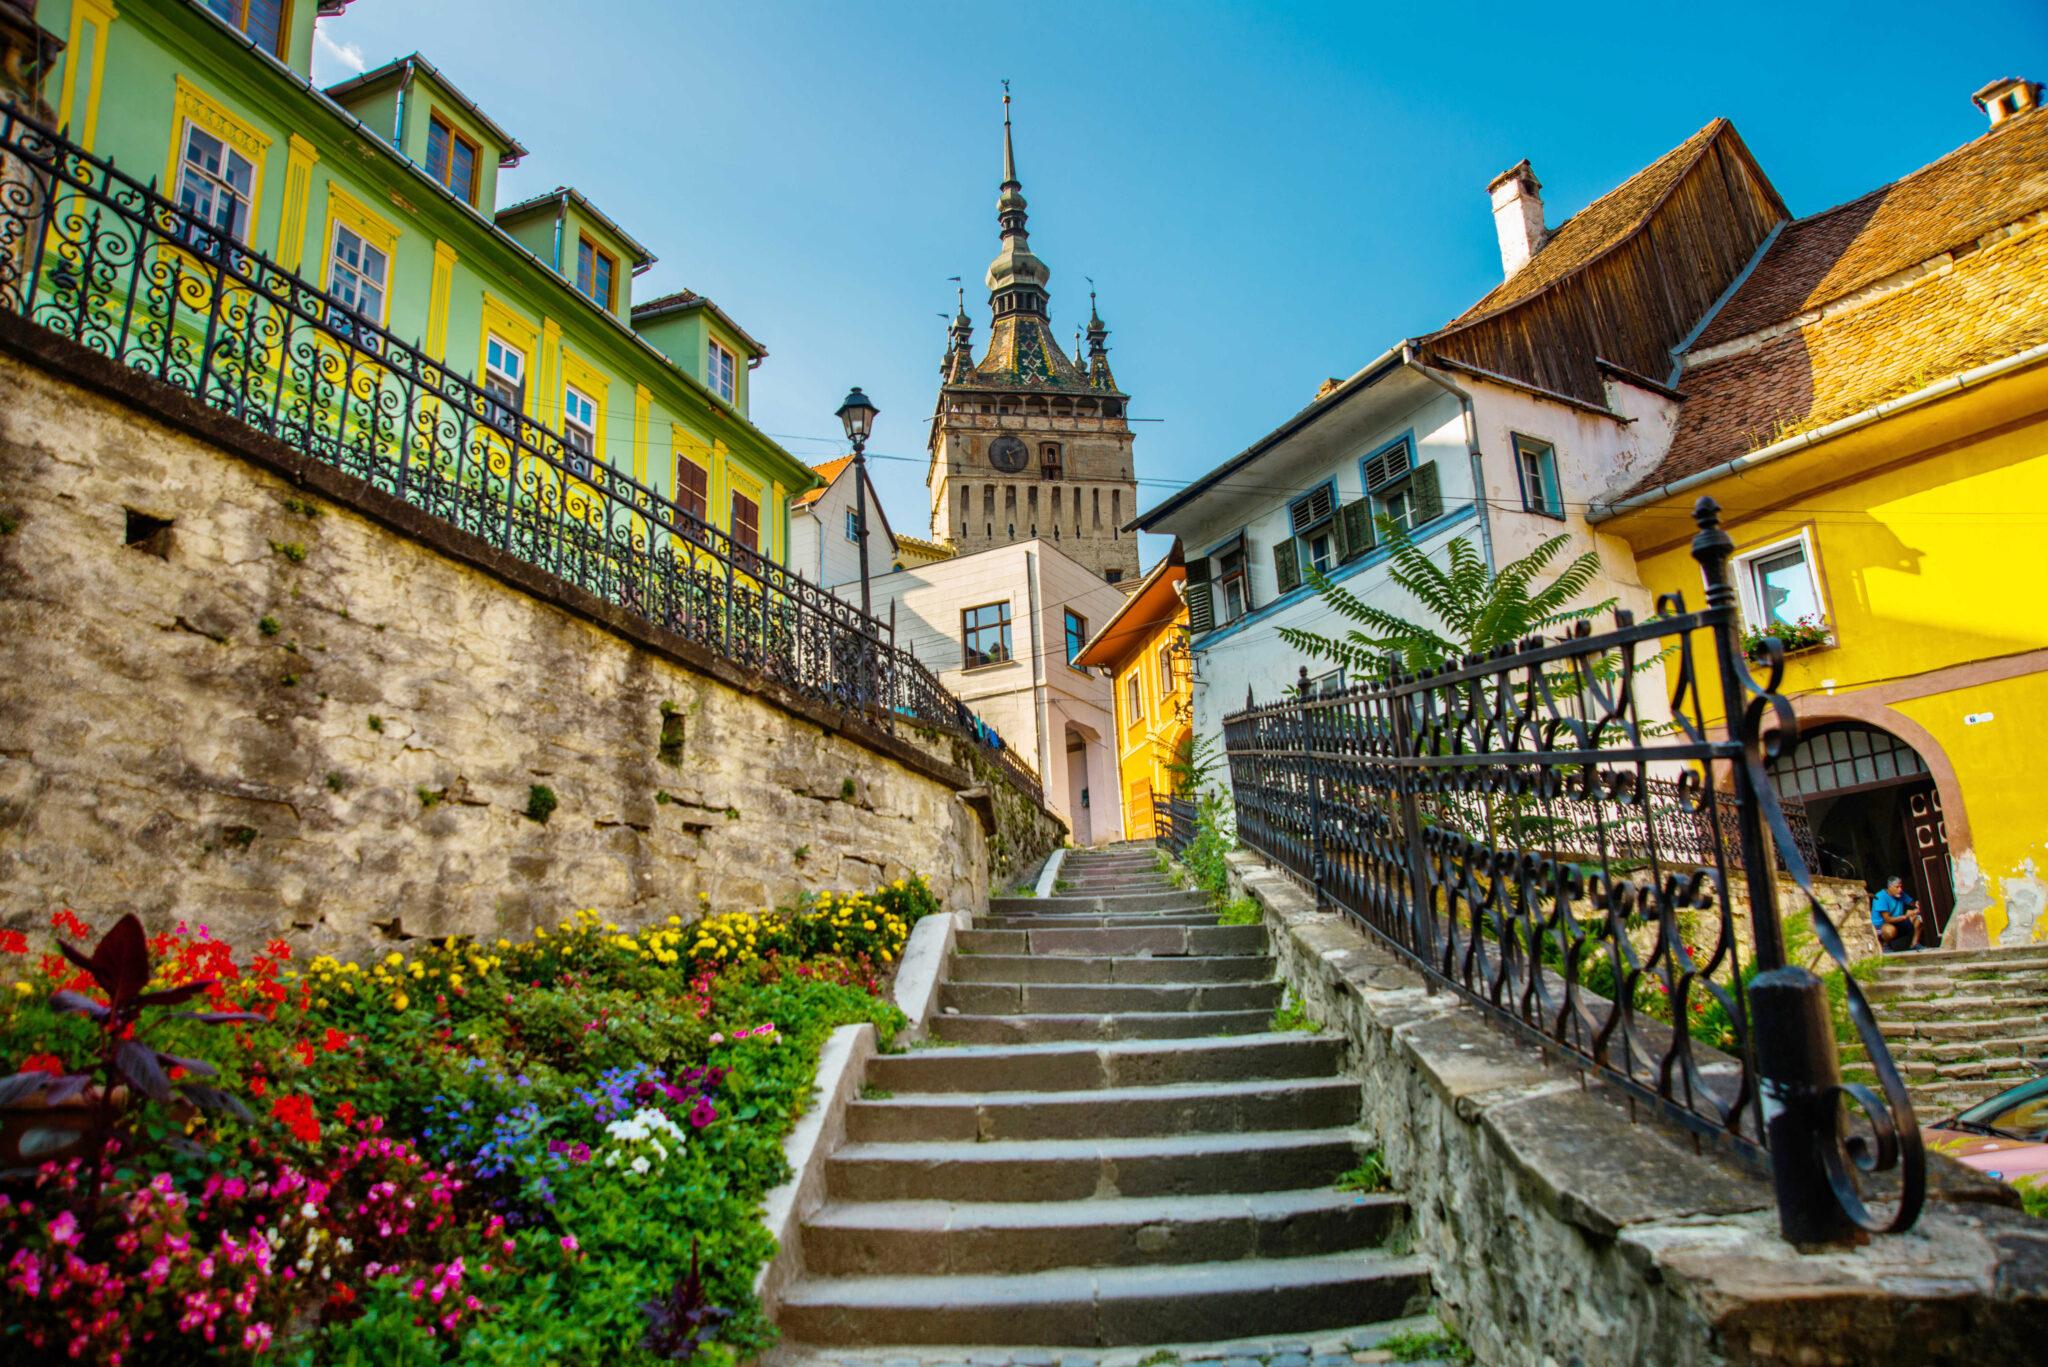 SIGHISOARA, TRANSYLVANIA, ROMANIA - AUGUST 2019: Old building in Sighisoara citadel. Tower Clock in Sighisoara. Turnul cu ceas